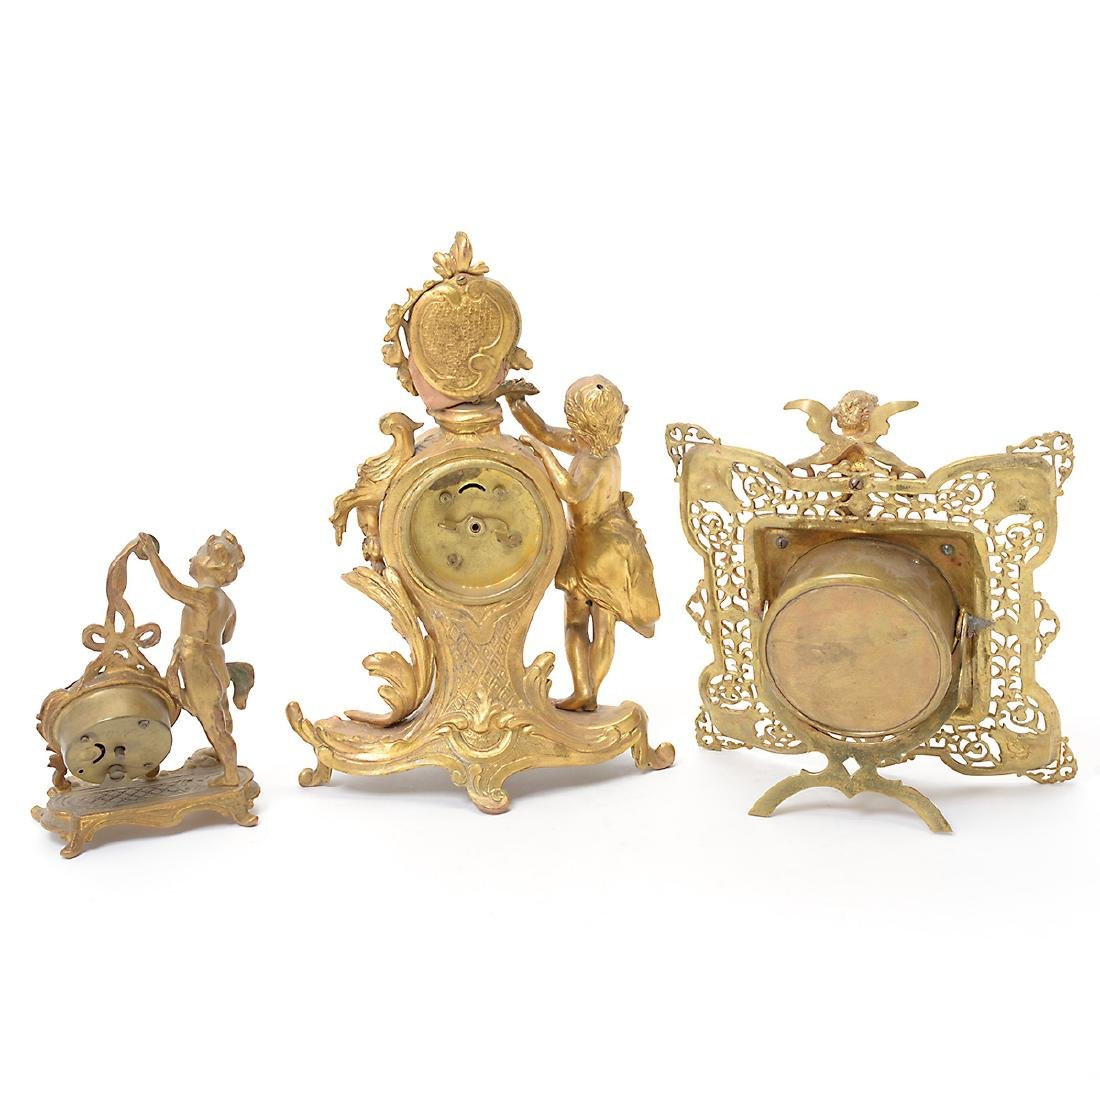 Three Louis XV Style Figural Clocks - 5